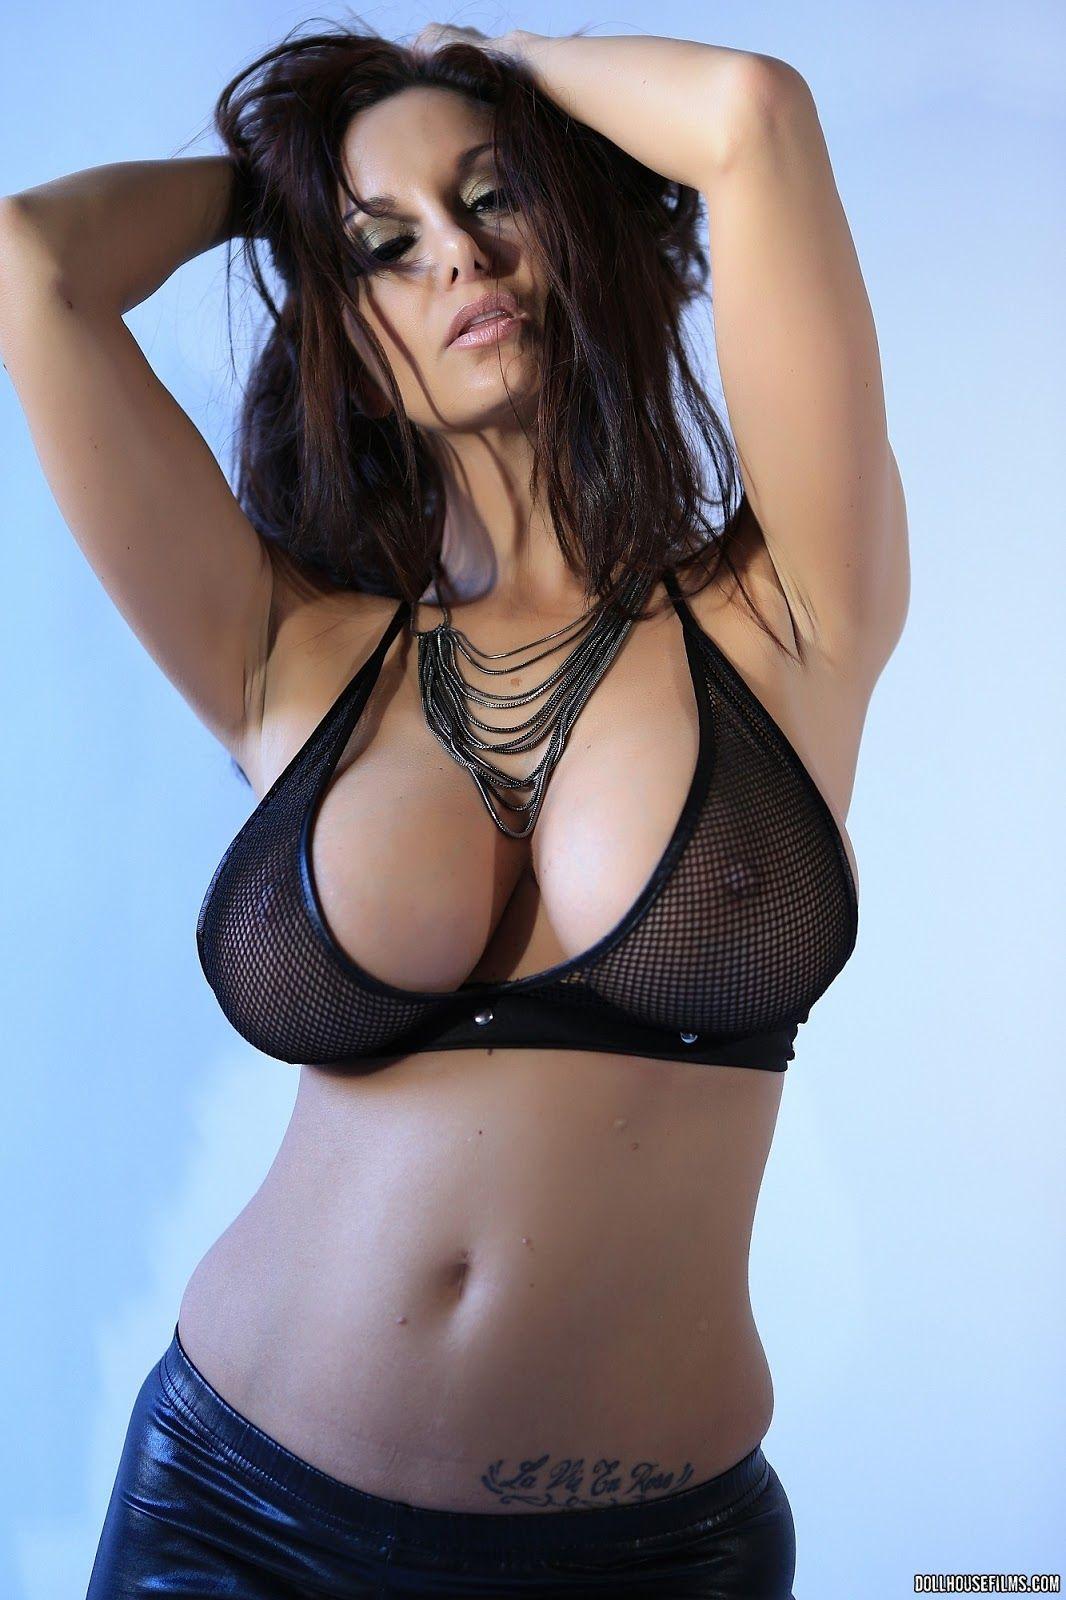 ava addams natural boobs - Sexy and Tough Ava Addams - Sexy Gallery Full Photo